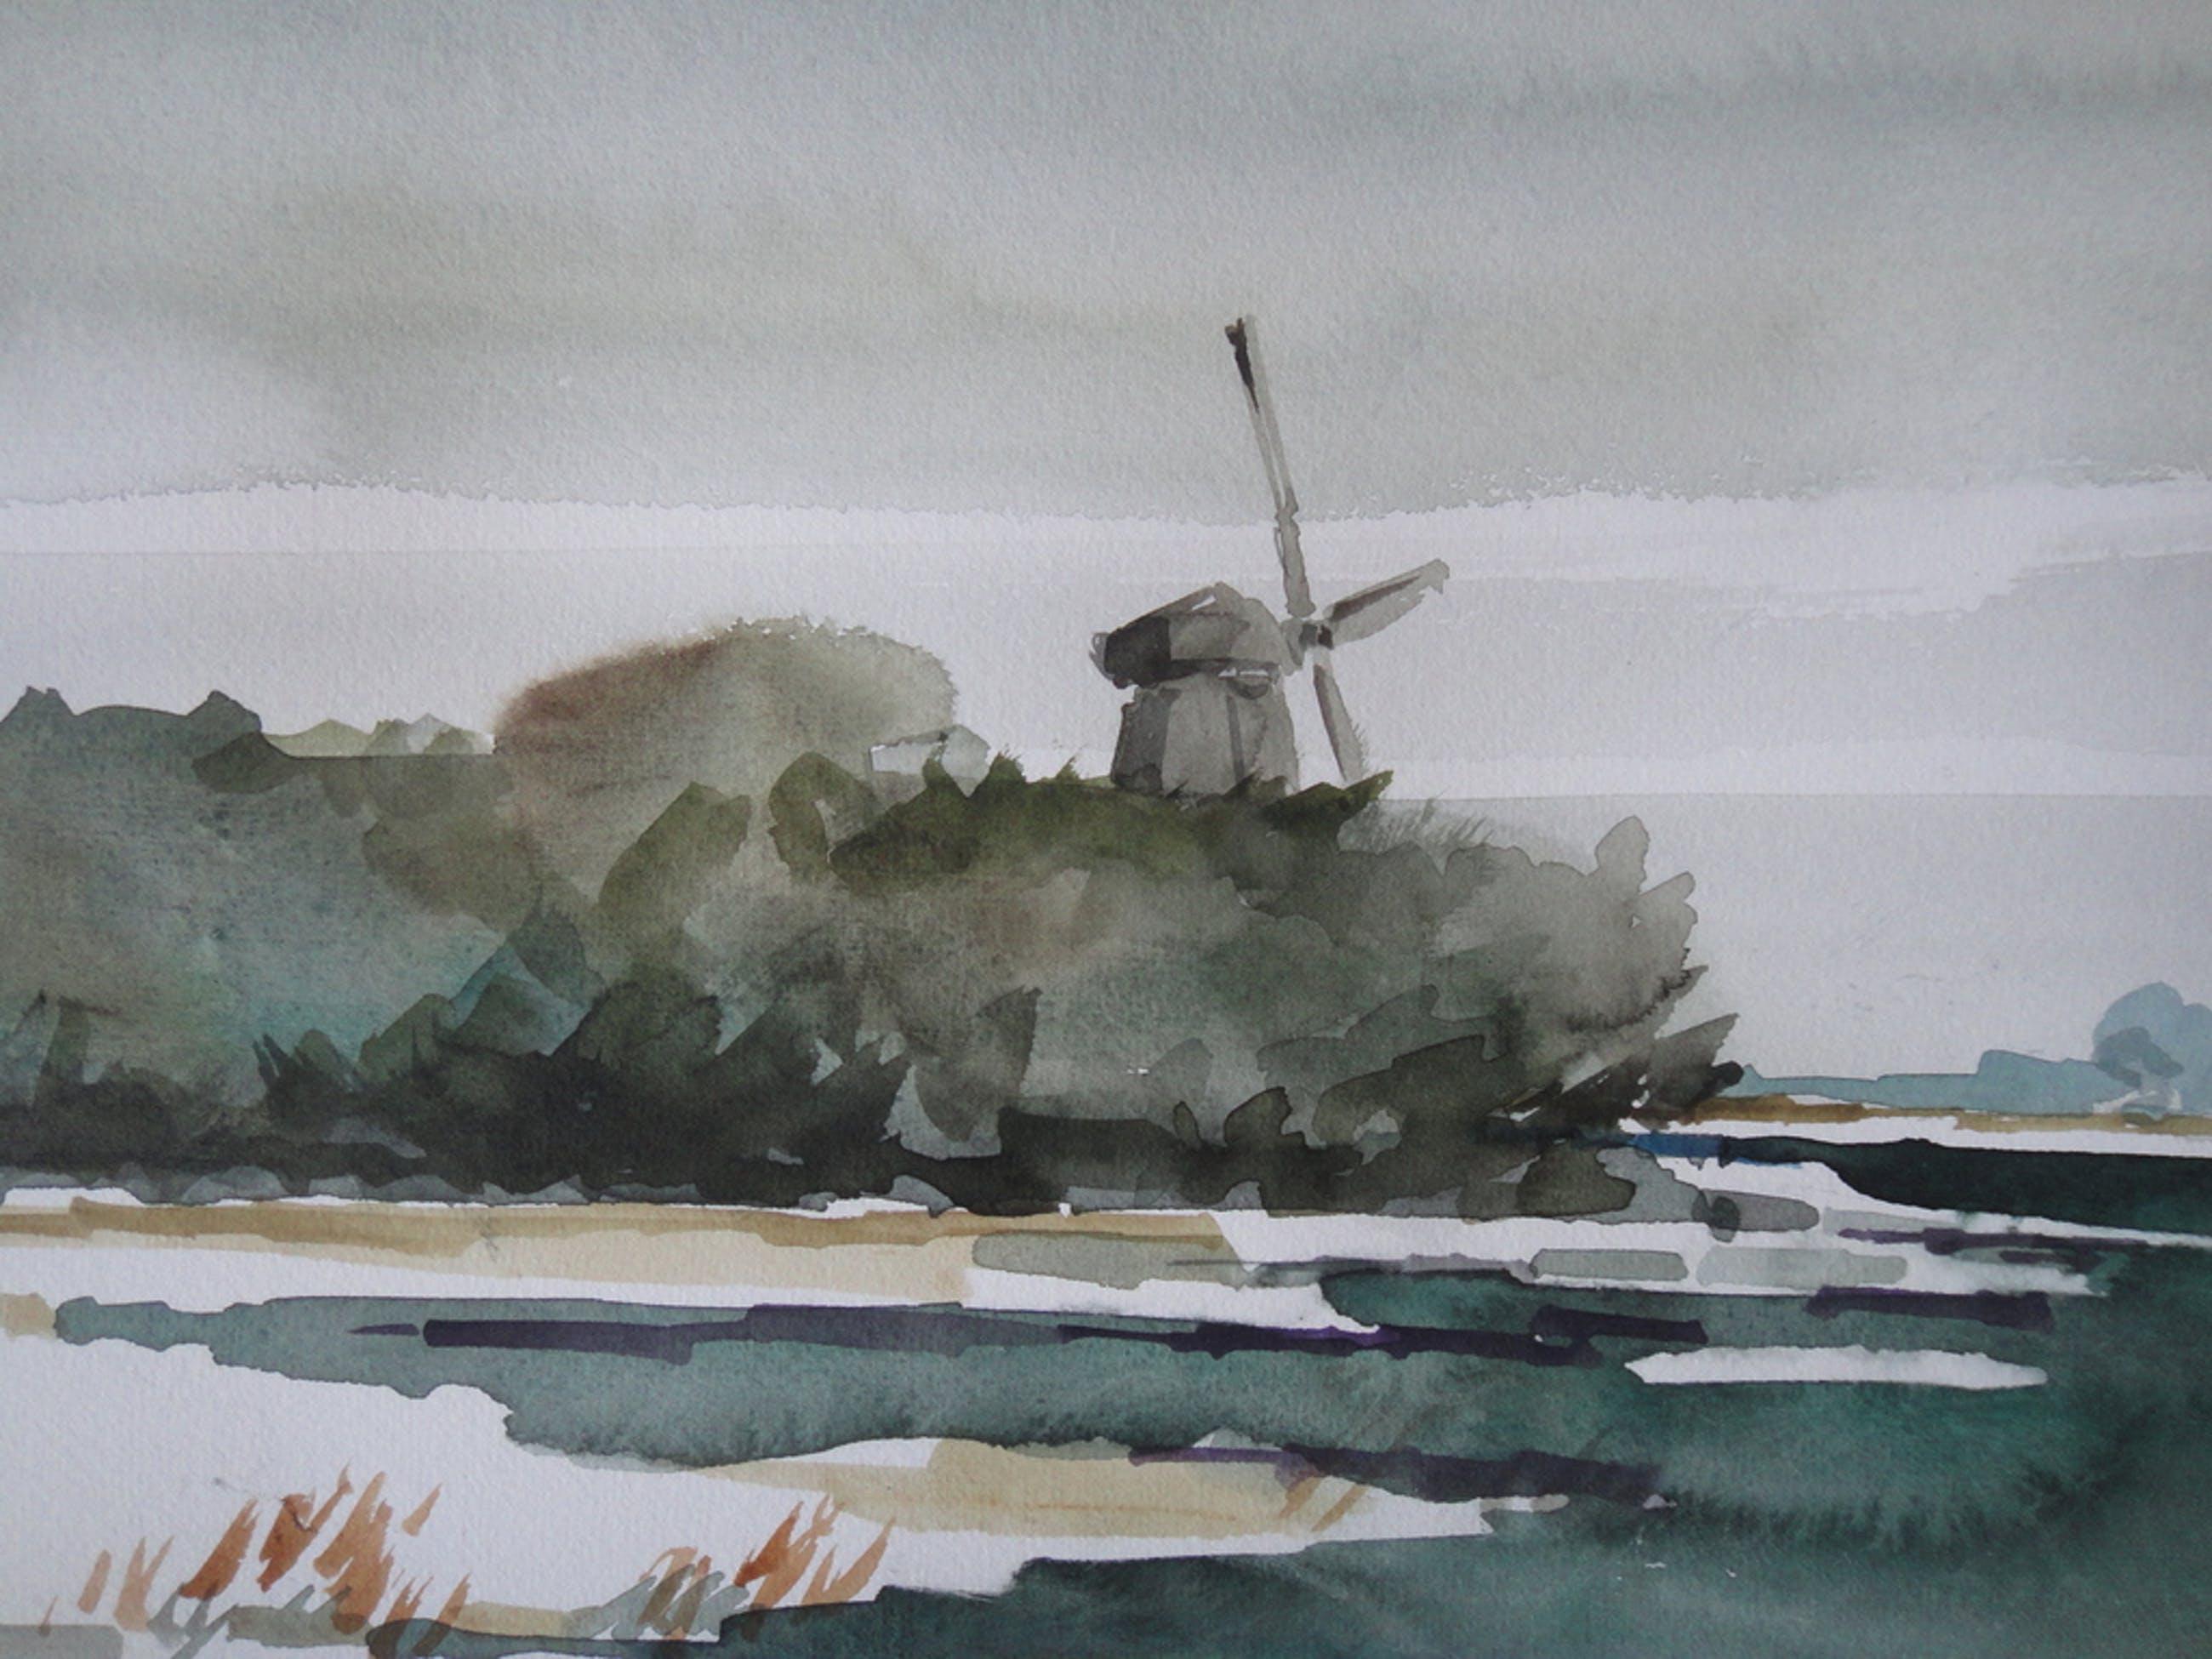 Bob (Petrus Theodorus) Immink, aquarel, polder te Waterland kopen? Bied vanaf 75!